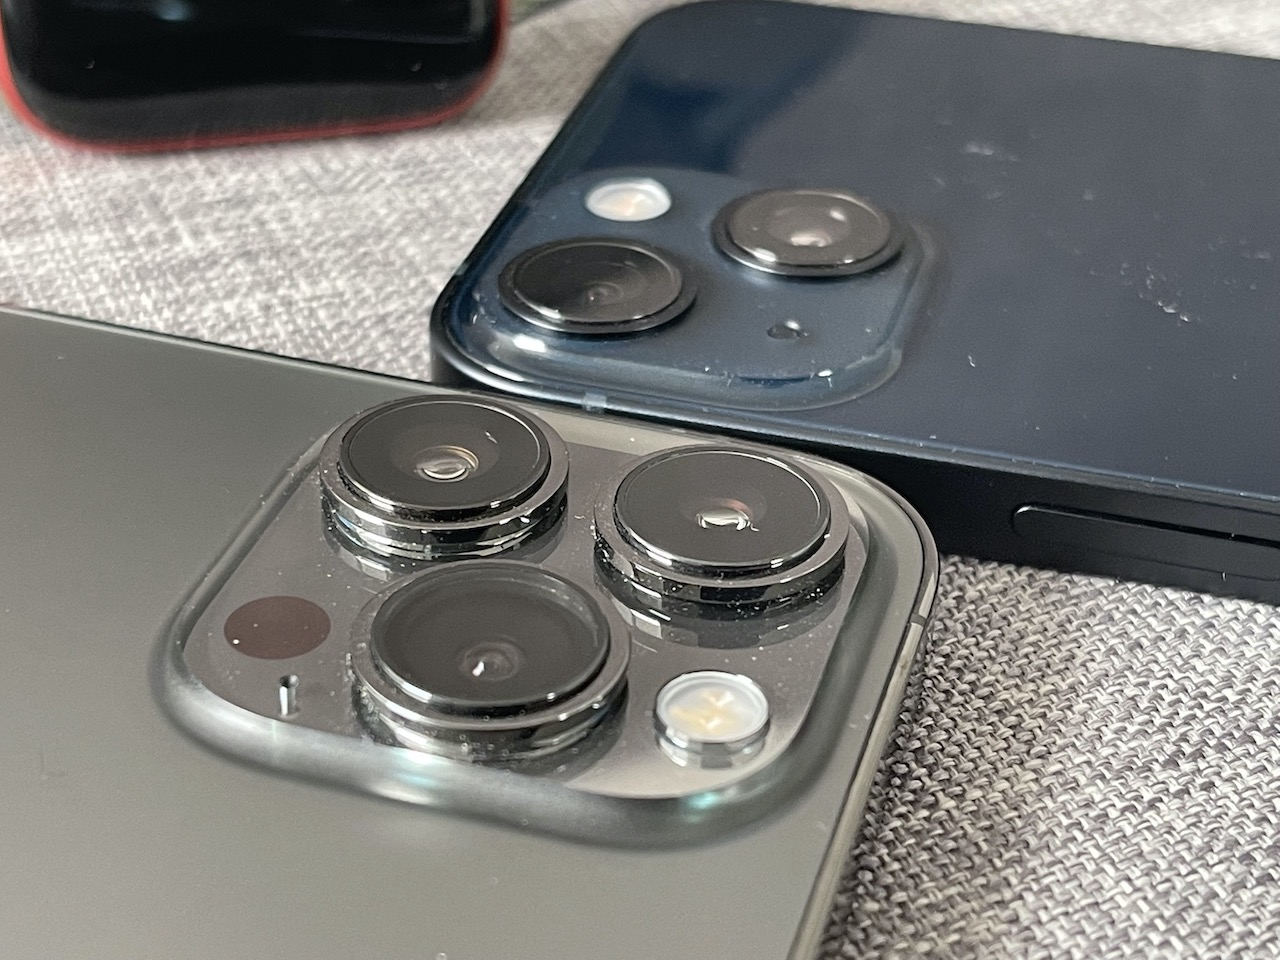 iPhone 13: Apple bietet die besten Akku-Laufzeiten – iPhone 13 Pro Max übernimmt Spitzenplatz › Macerkopf